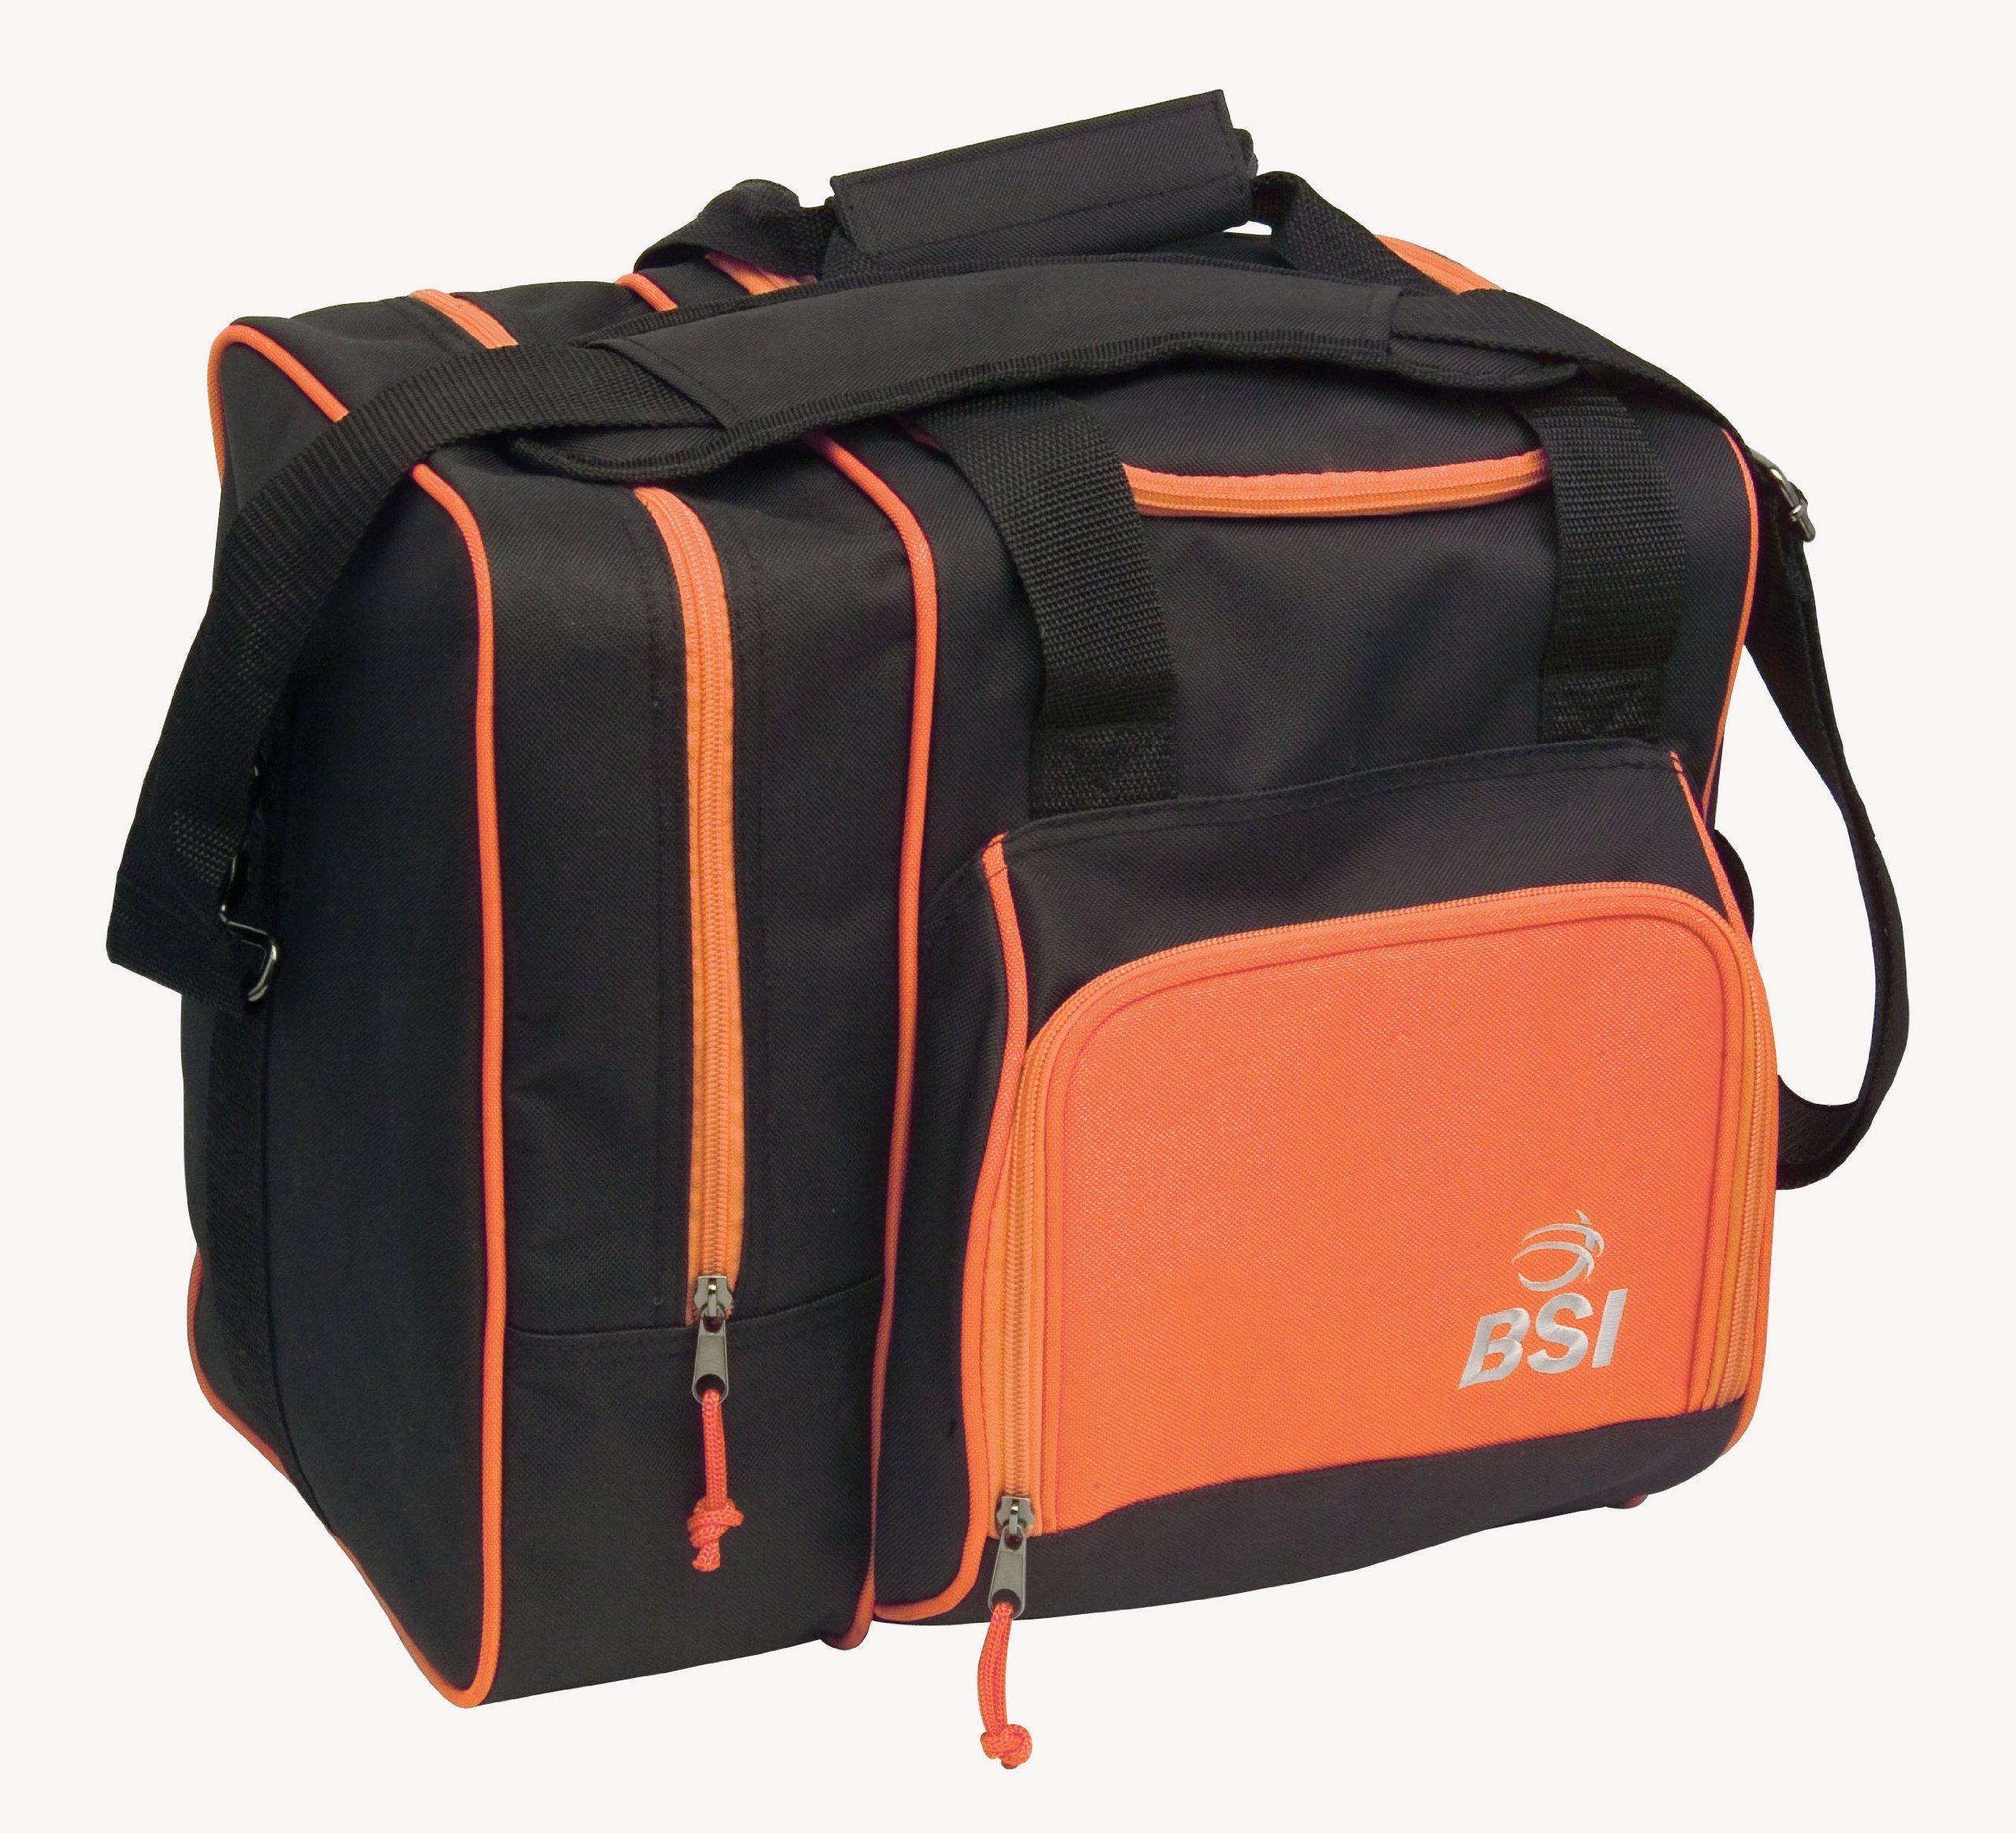 BSI Deluxe Single Ball Tote Bag (Black/Orange)